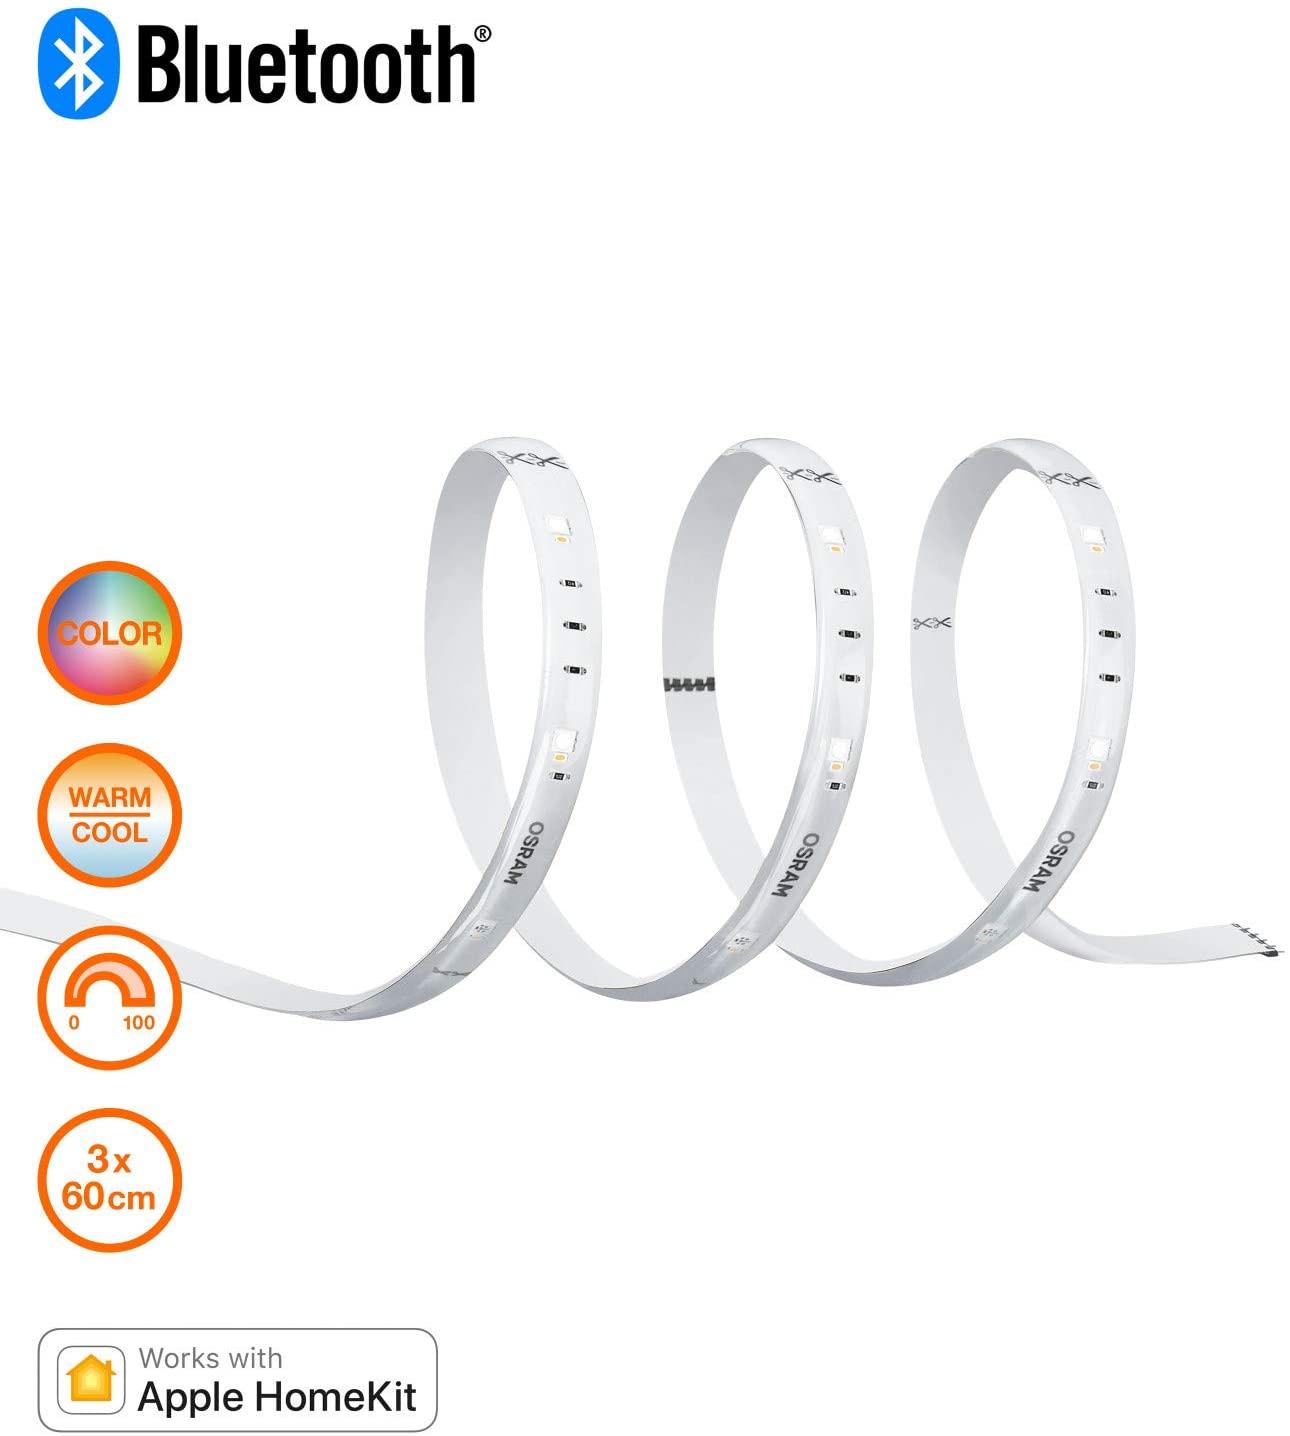 OSRAM SMART+ LED Stripe, Bluetooth LED Strip, dimmable, warm white to daylight180cm £18.68 @ Amazon (+£4.49 Non-prime)